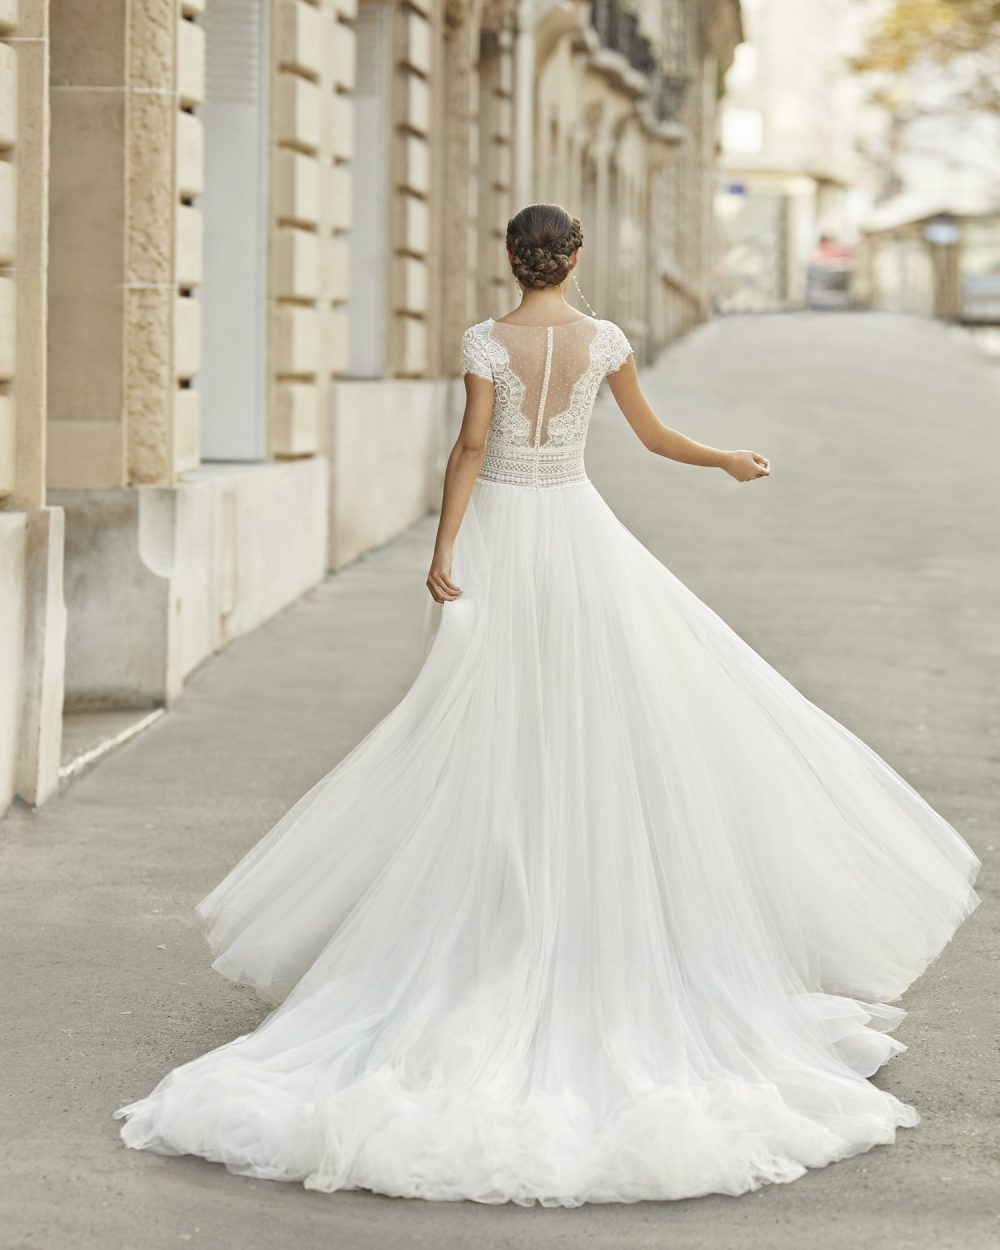 Mariages: abito da sposa Rosa Clarà 2021 a Vicenza, Verona, Padova, Veneto 5A151 TESALIA